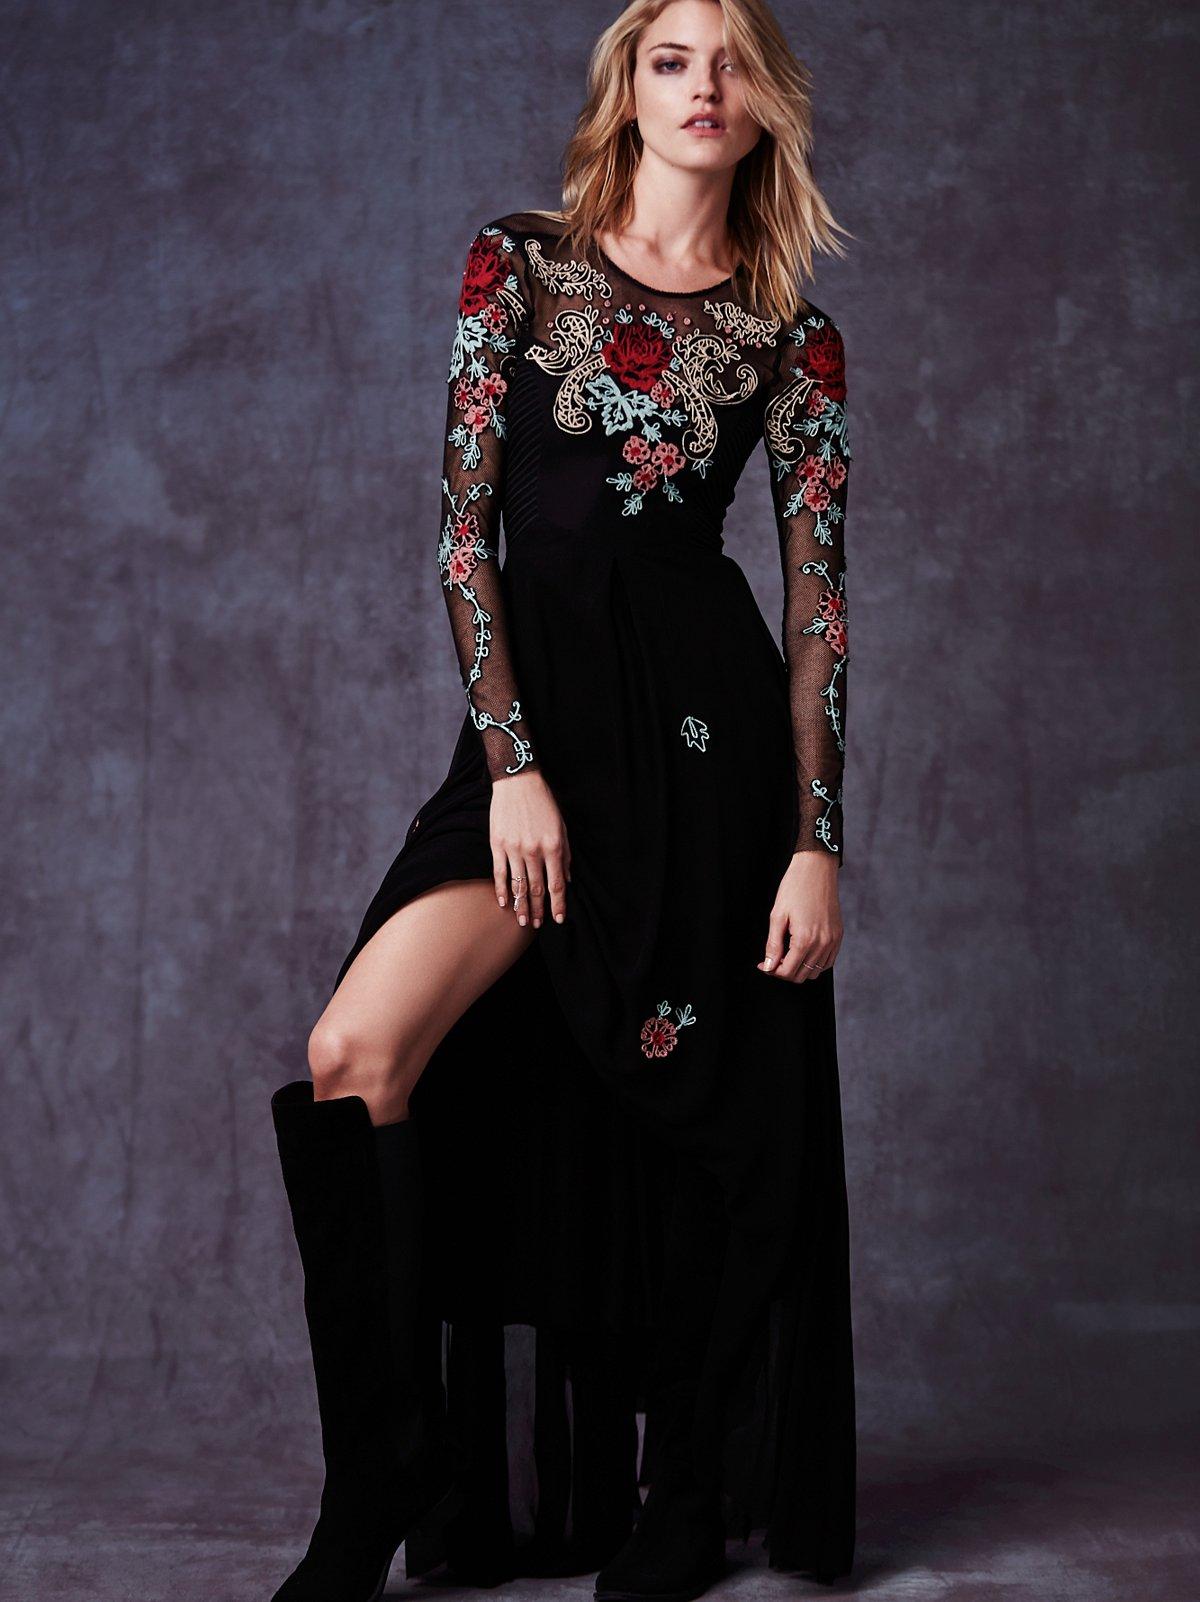 Elizabeth连衣裙